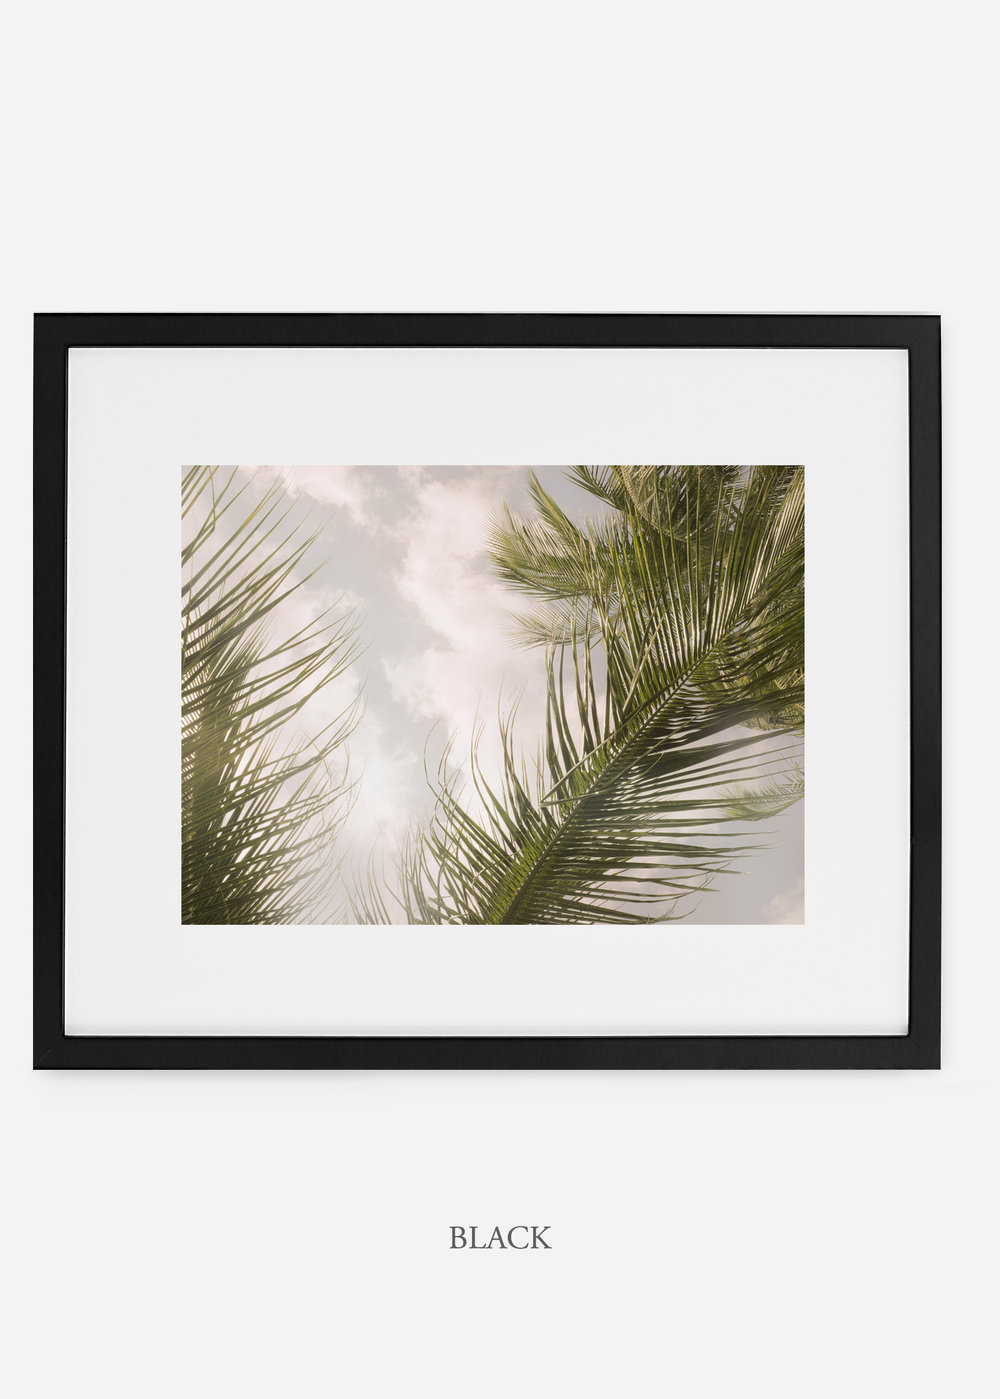 interiordesign_blackframe_AiryPalmTreeNo.1_art_tropical_palmtree_StormyGrayPalm.jpg